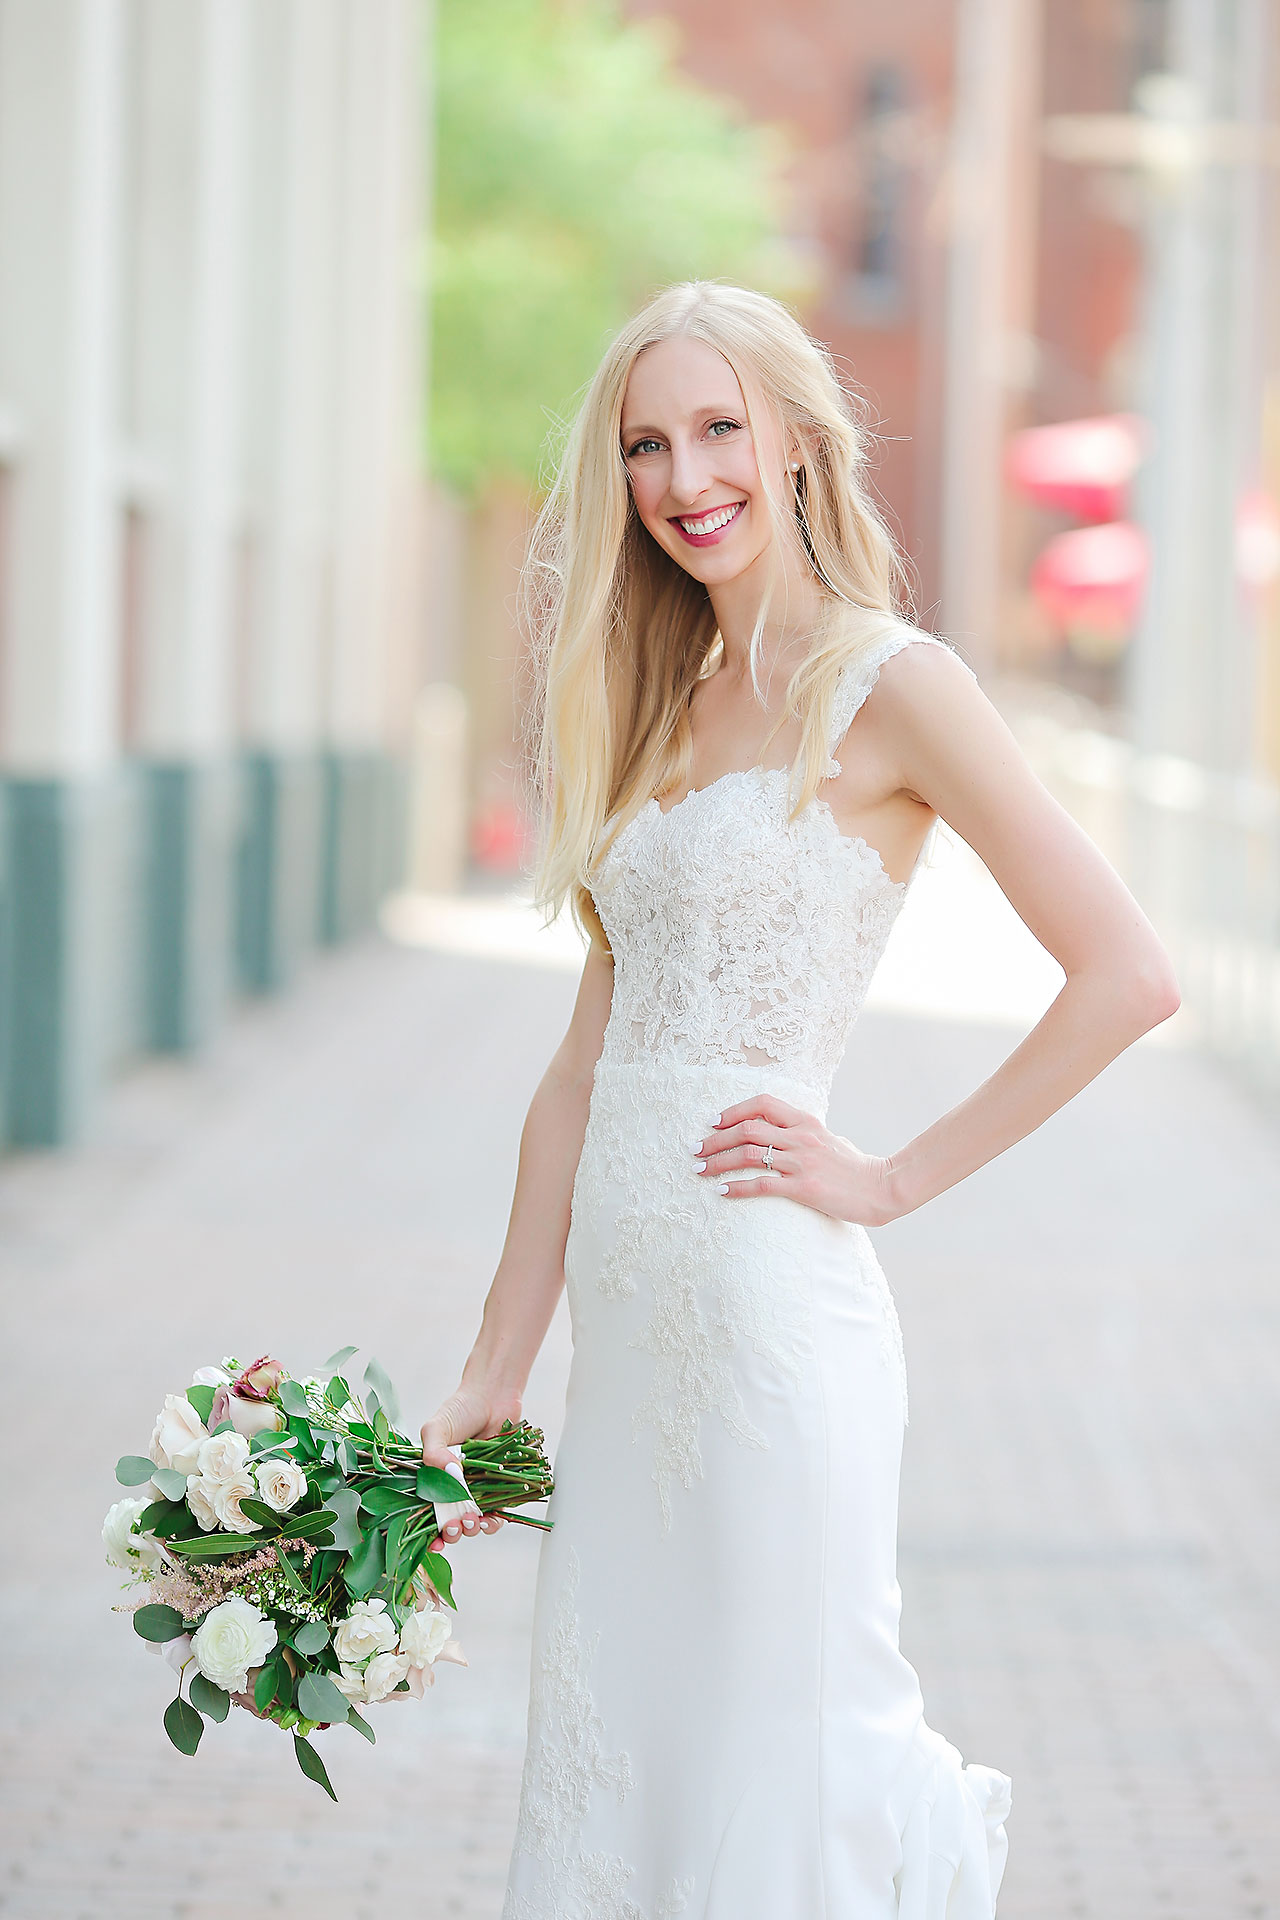 Molly Declan Scottish Rite Indianapolis Wedding 106